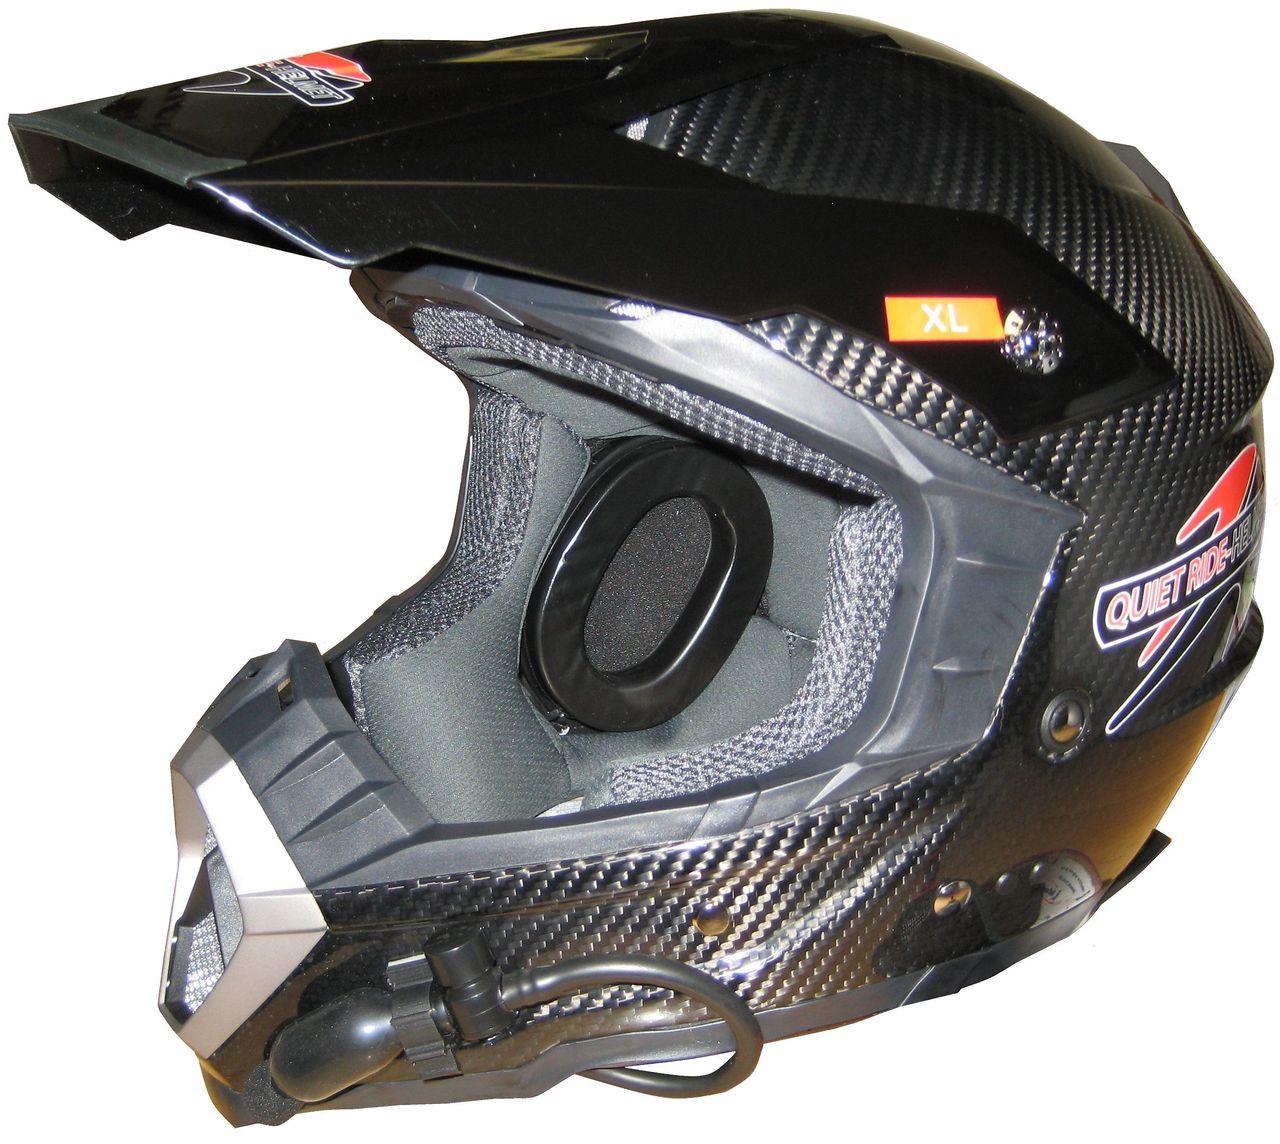 Quiet Ride Noise Reduction Helmet | Carbon Fiber Motocross Helmet